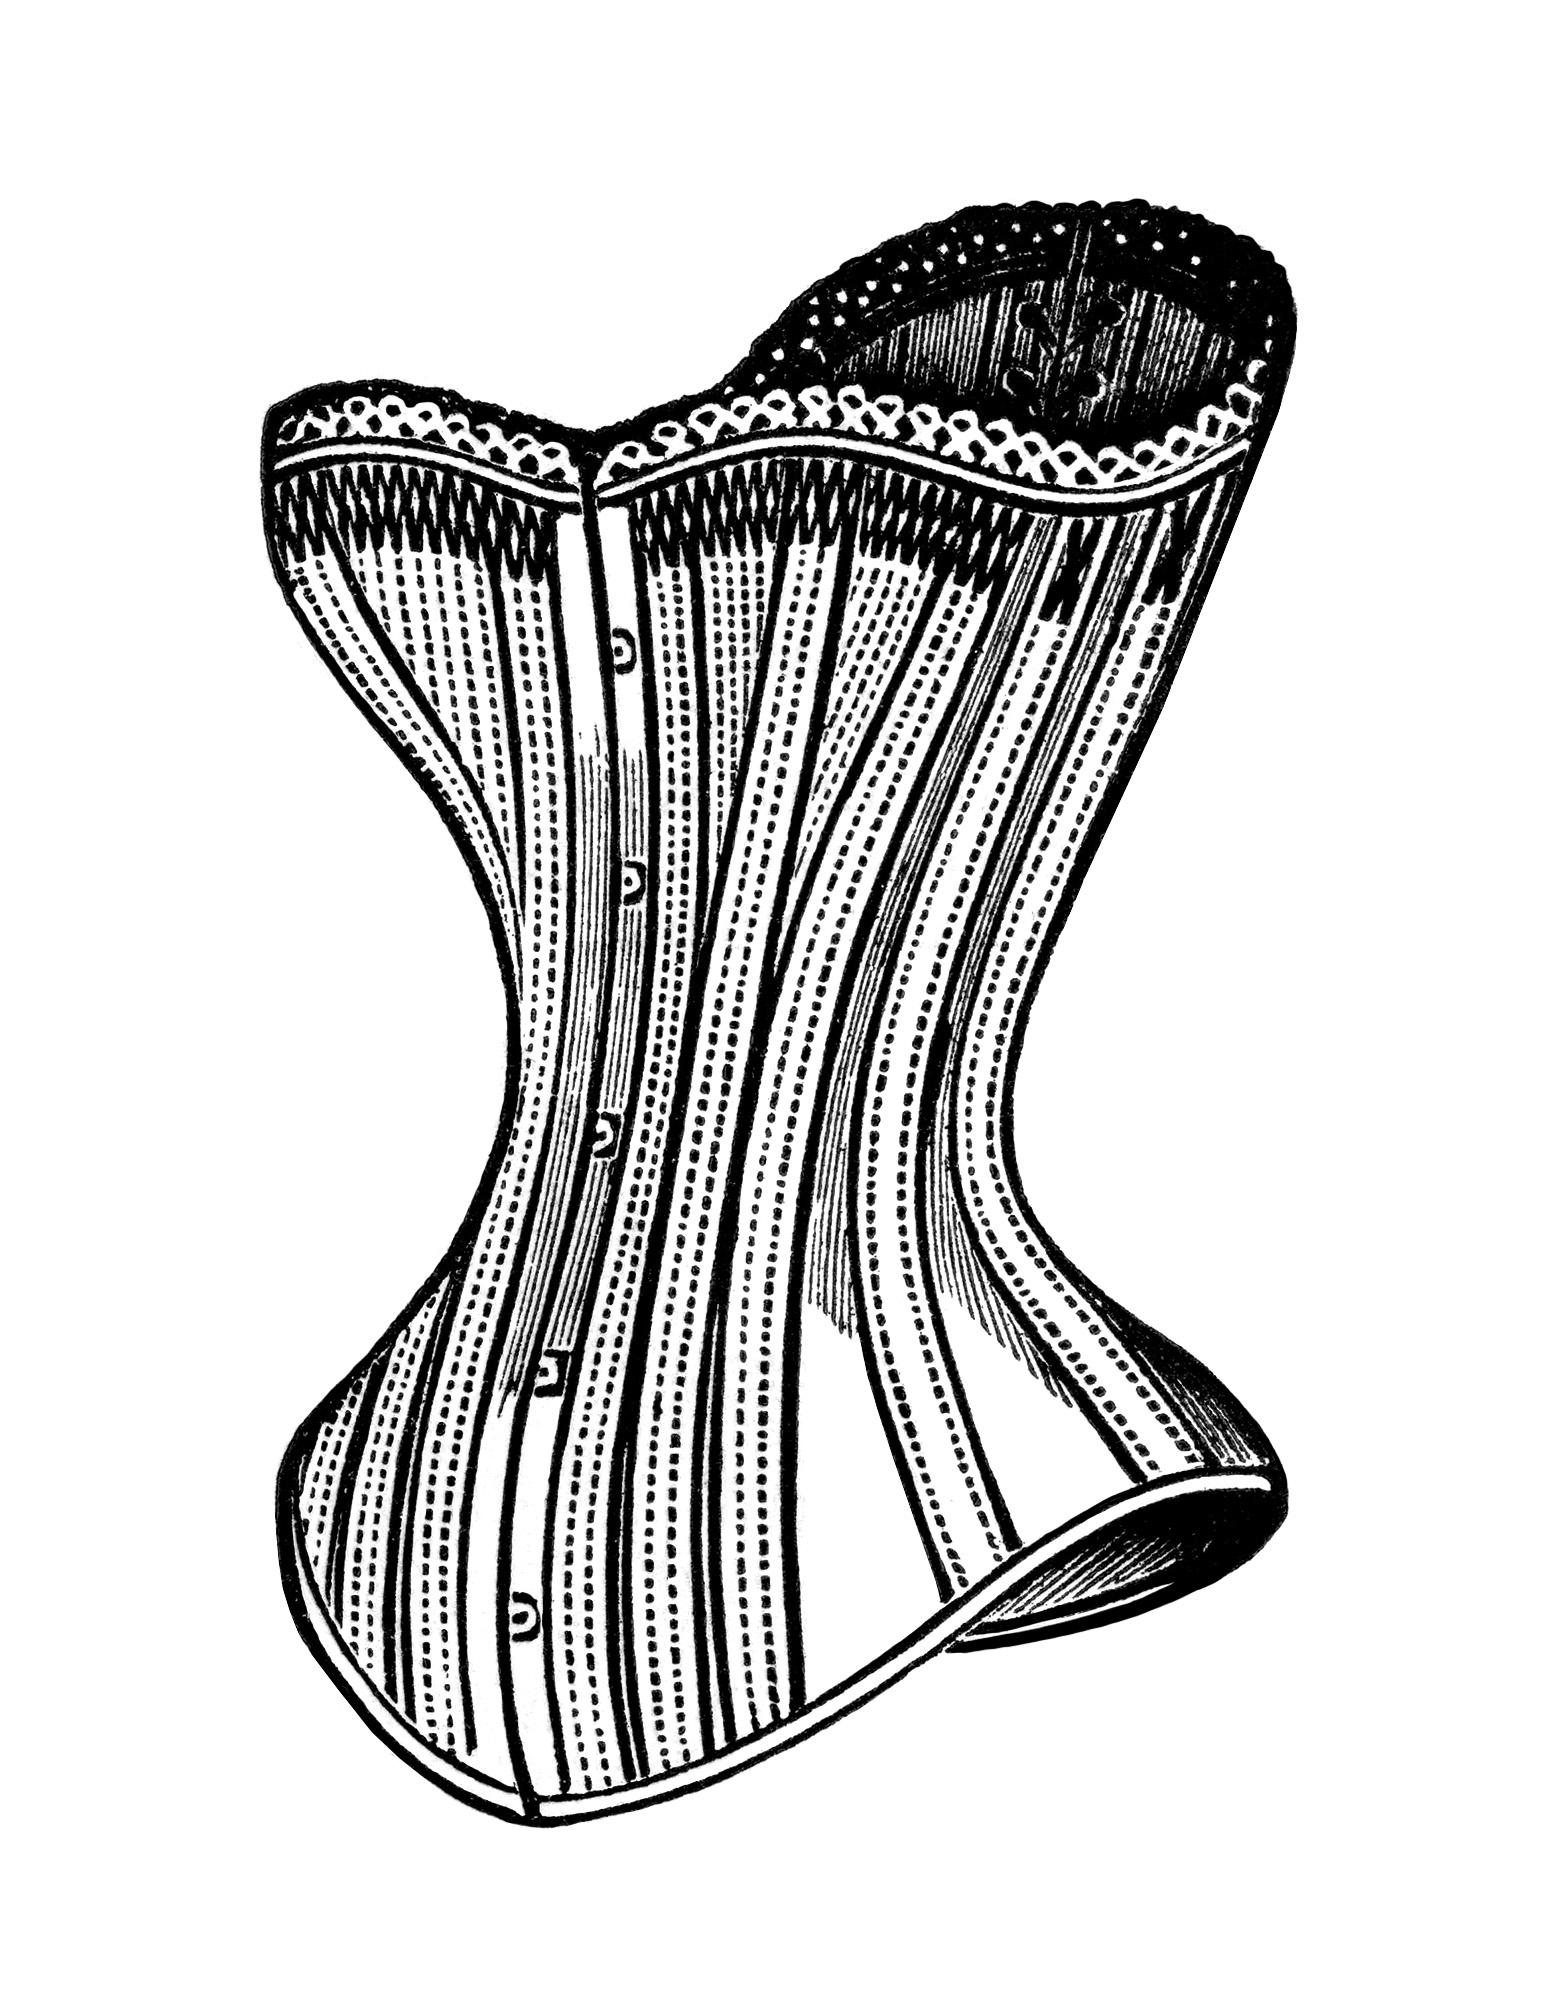 black and white clip art, free steampunk graphics, victorian corset image, vintage corset clipart, edwardian fashion illustration